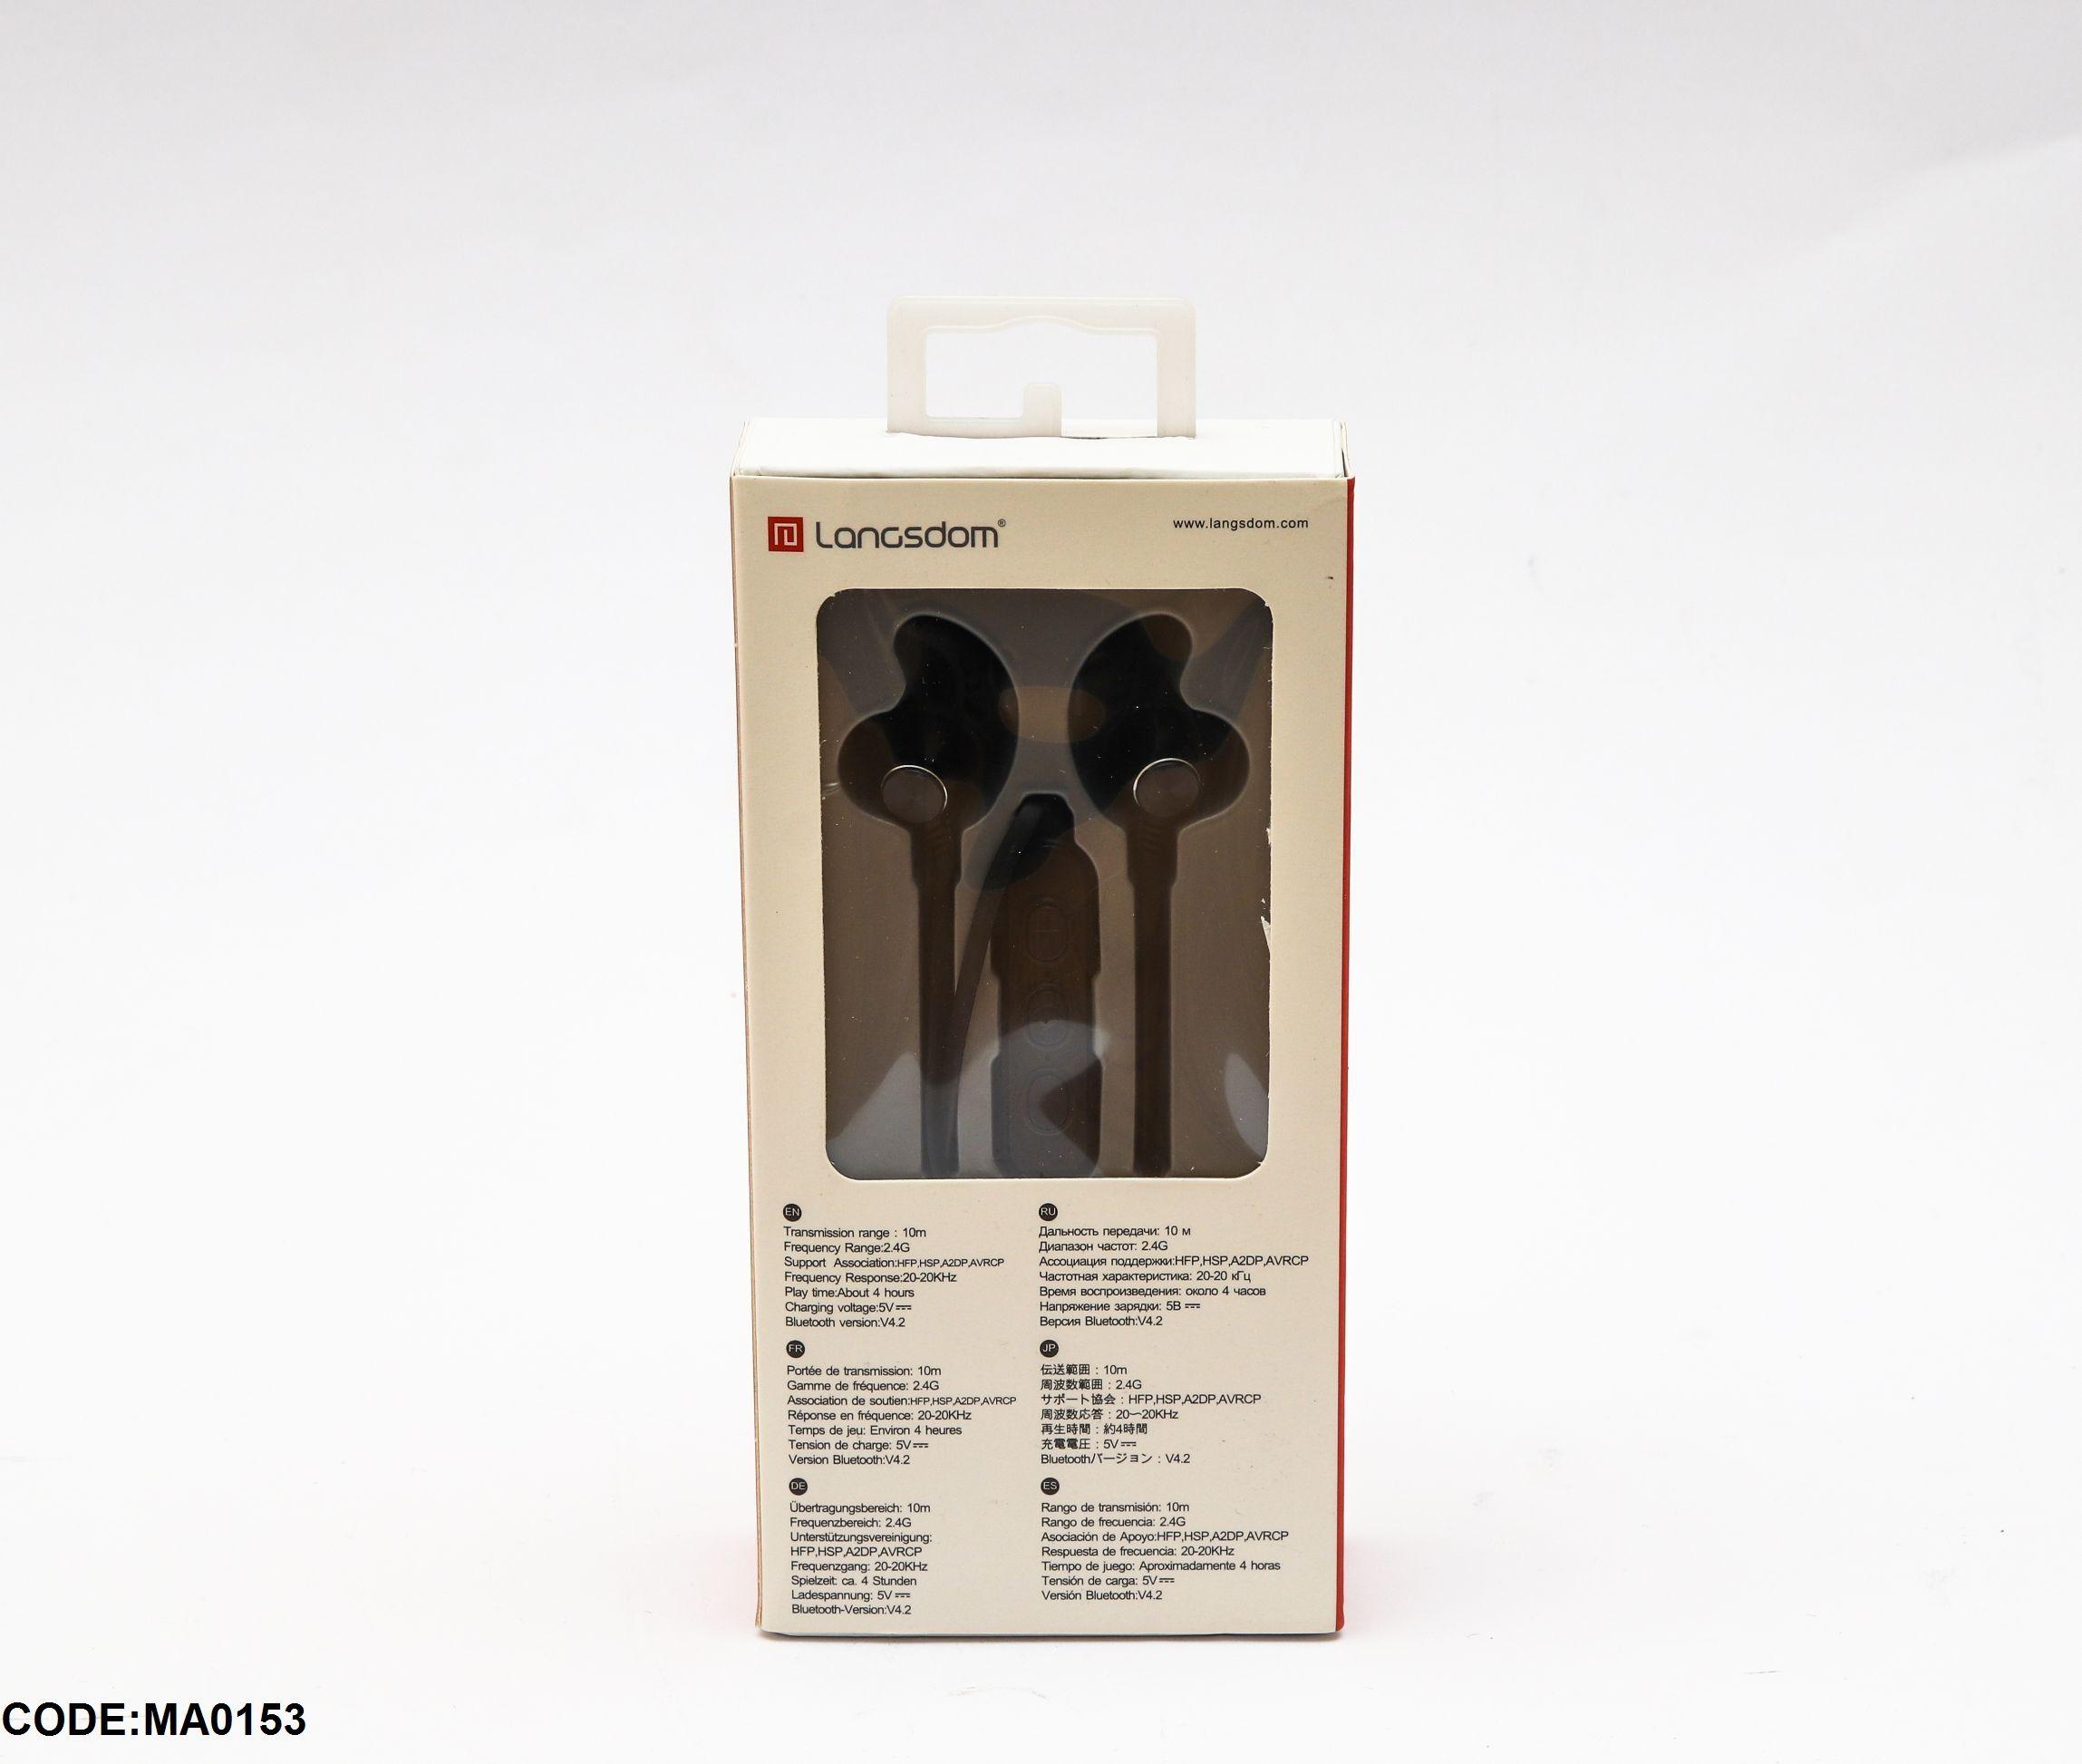 Bluetooth Headphones Langsdom بسعر 180ج بدل من 250ج Online Phone Accessories Online Store